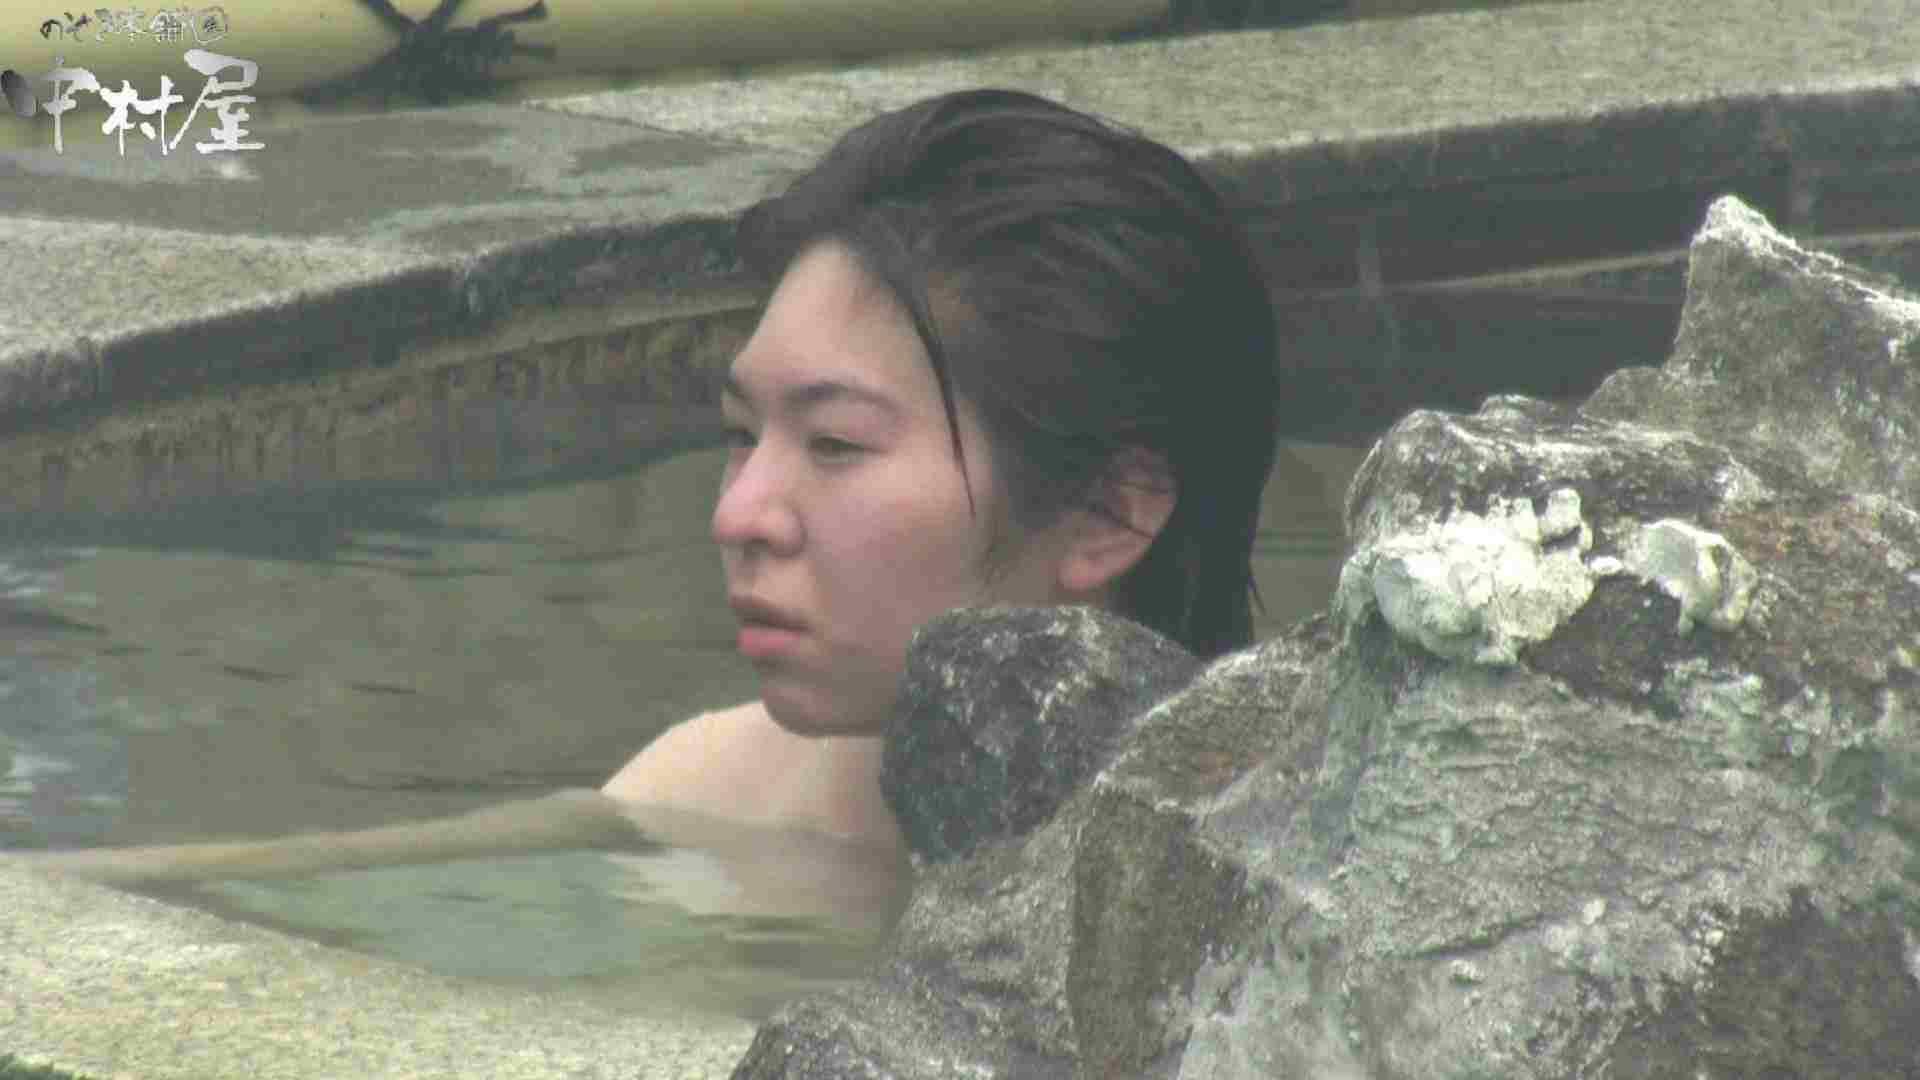 Aquaな露天風呂Vol.907 露天風呂 隠し撮りオマンコ動画紹介 62連発 29